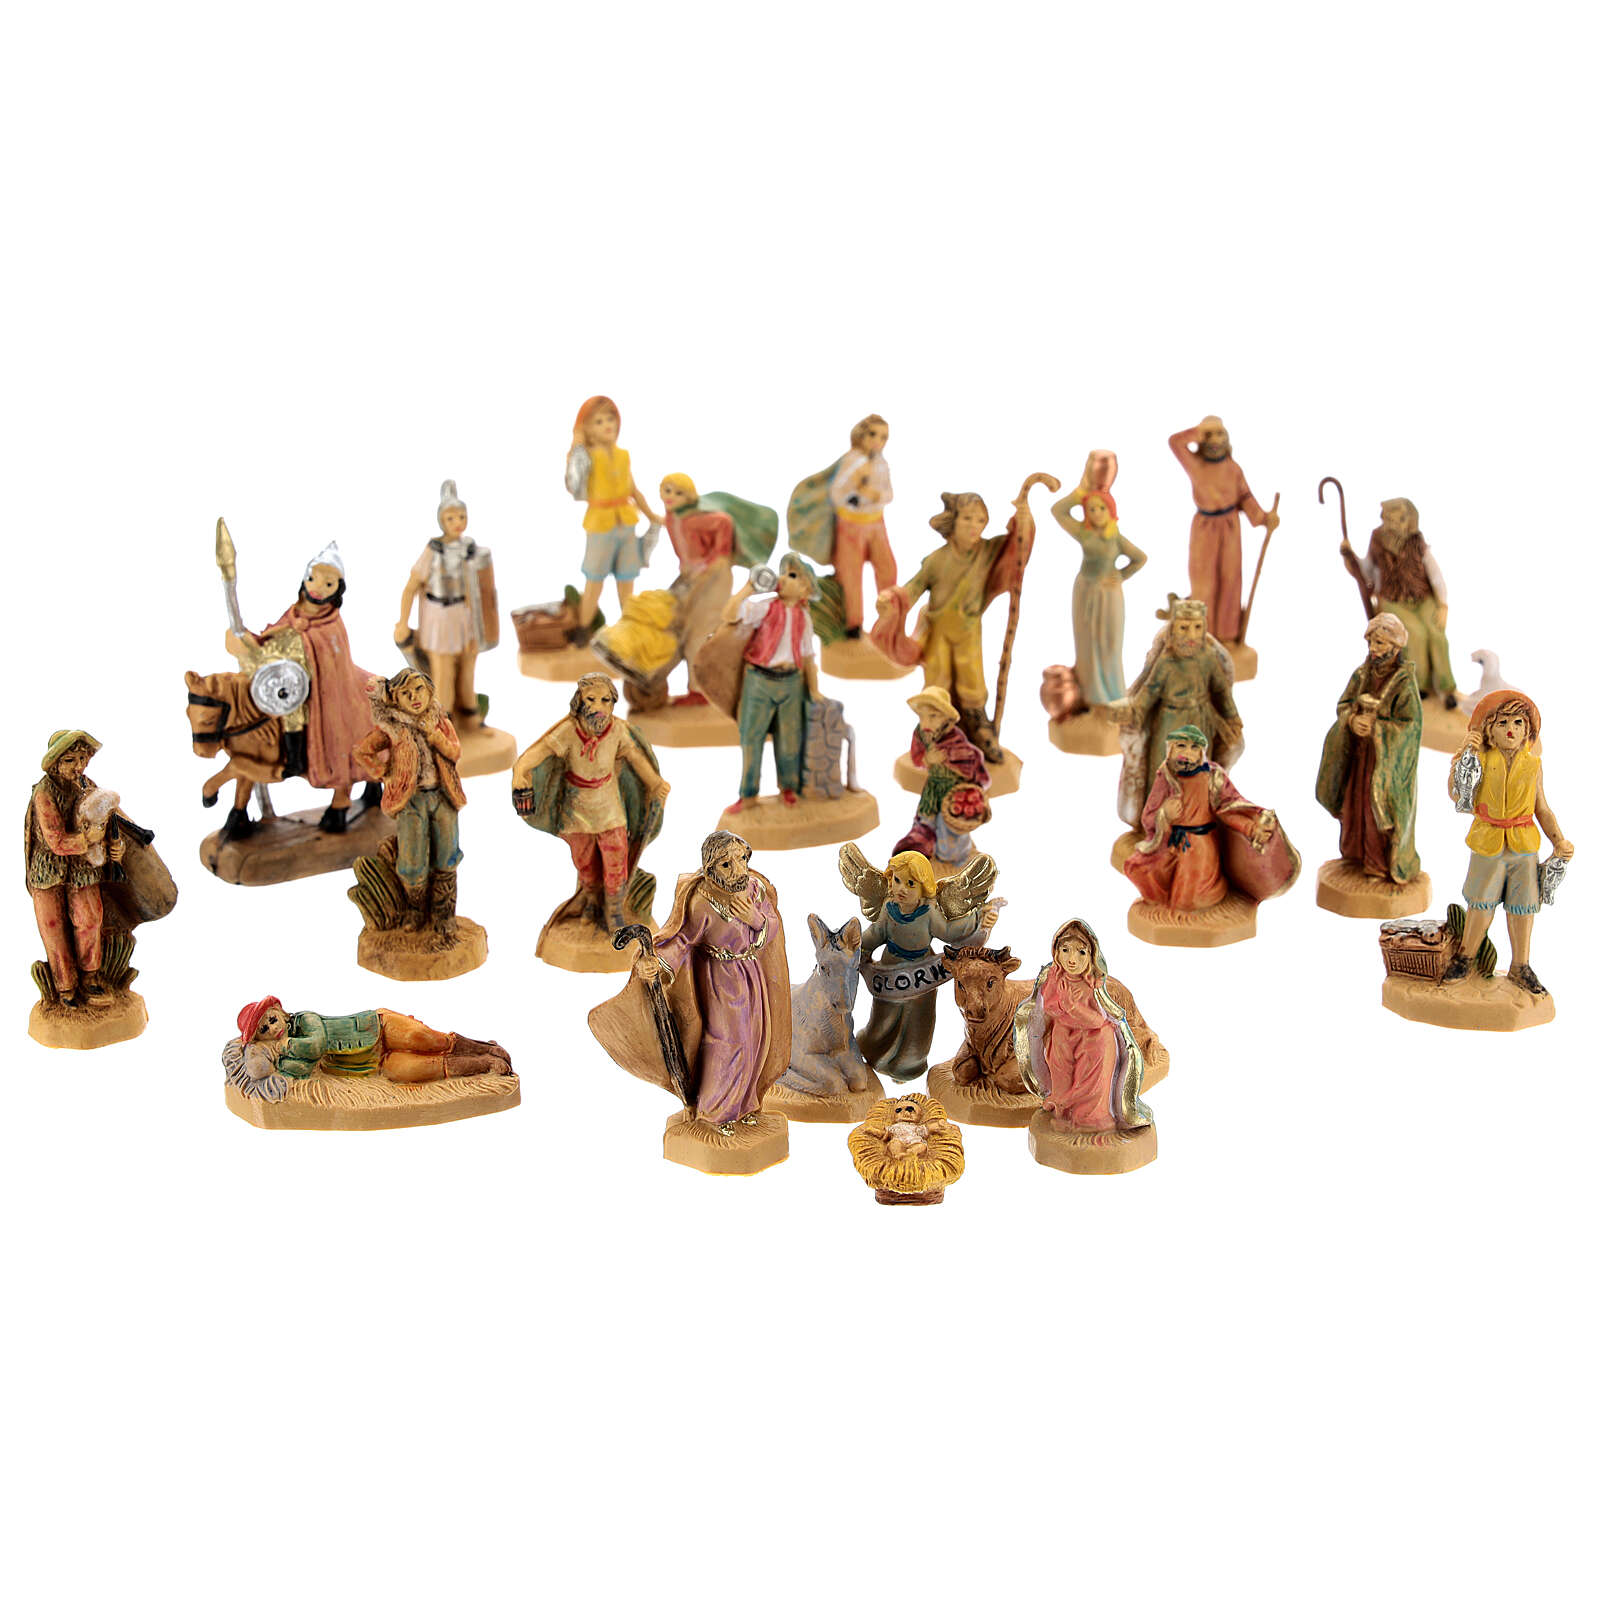 Wooden nativity scene characters 25 pcs 4 cm 3